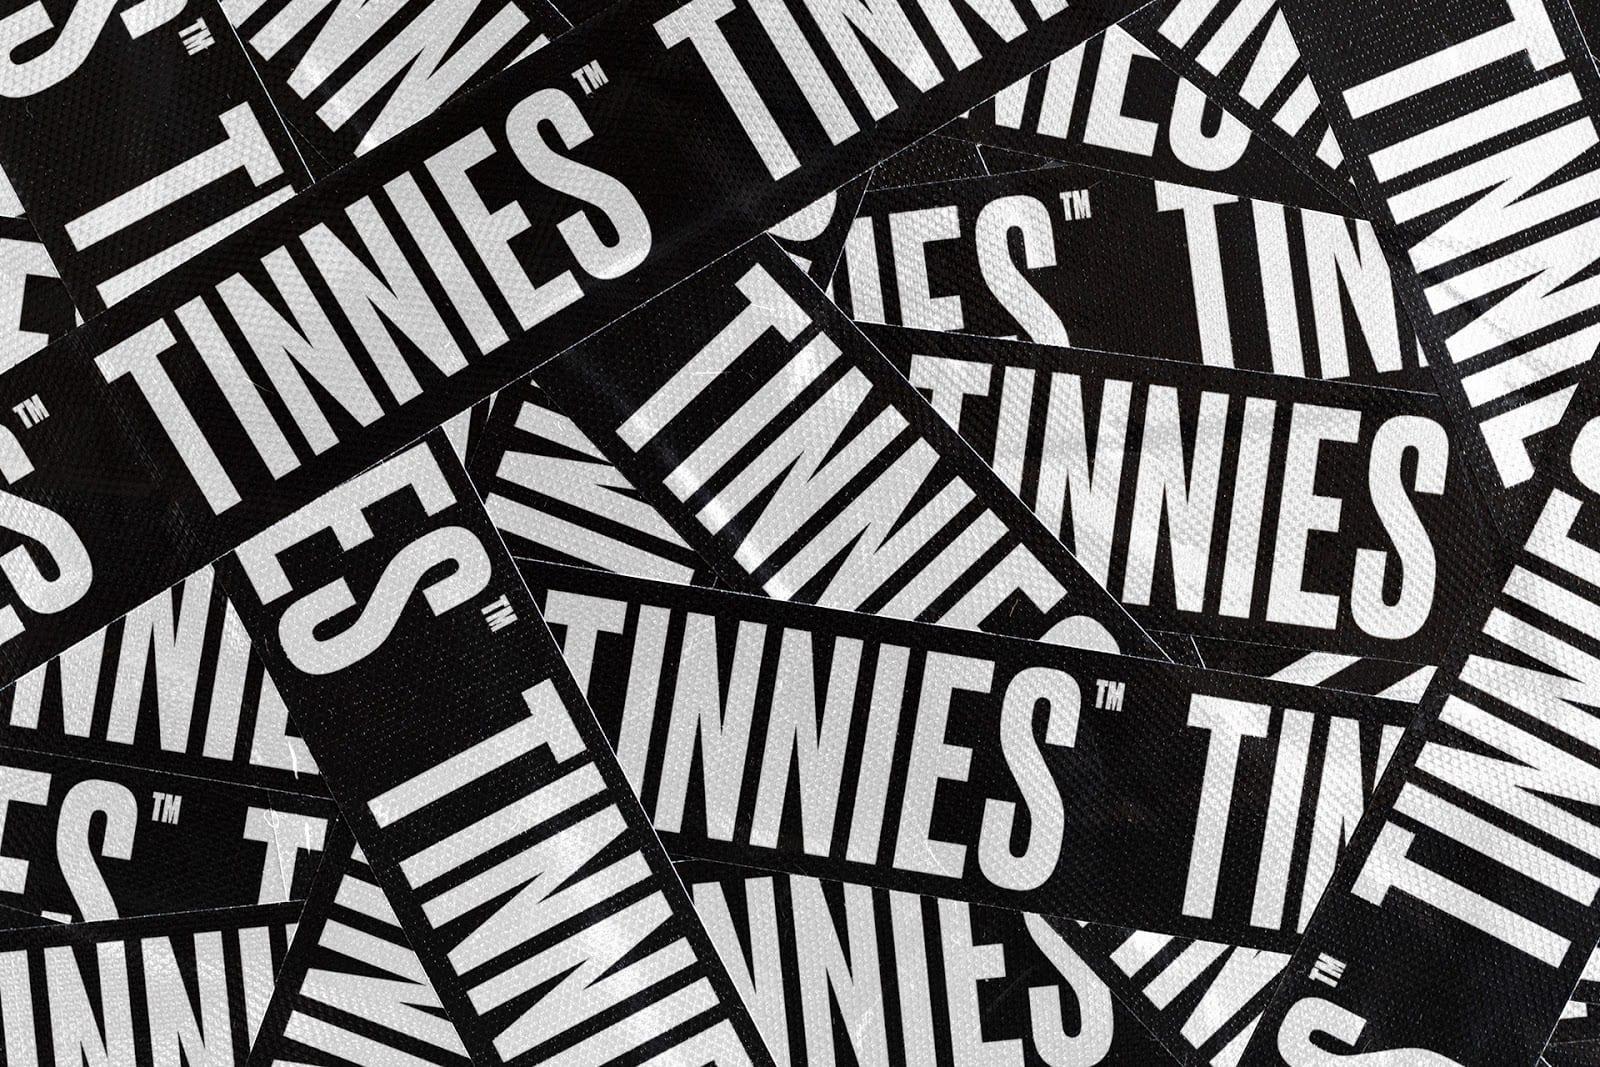 08 tinnies case study - Ach, tie obaly – Tinnier